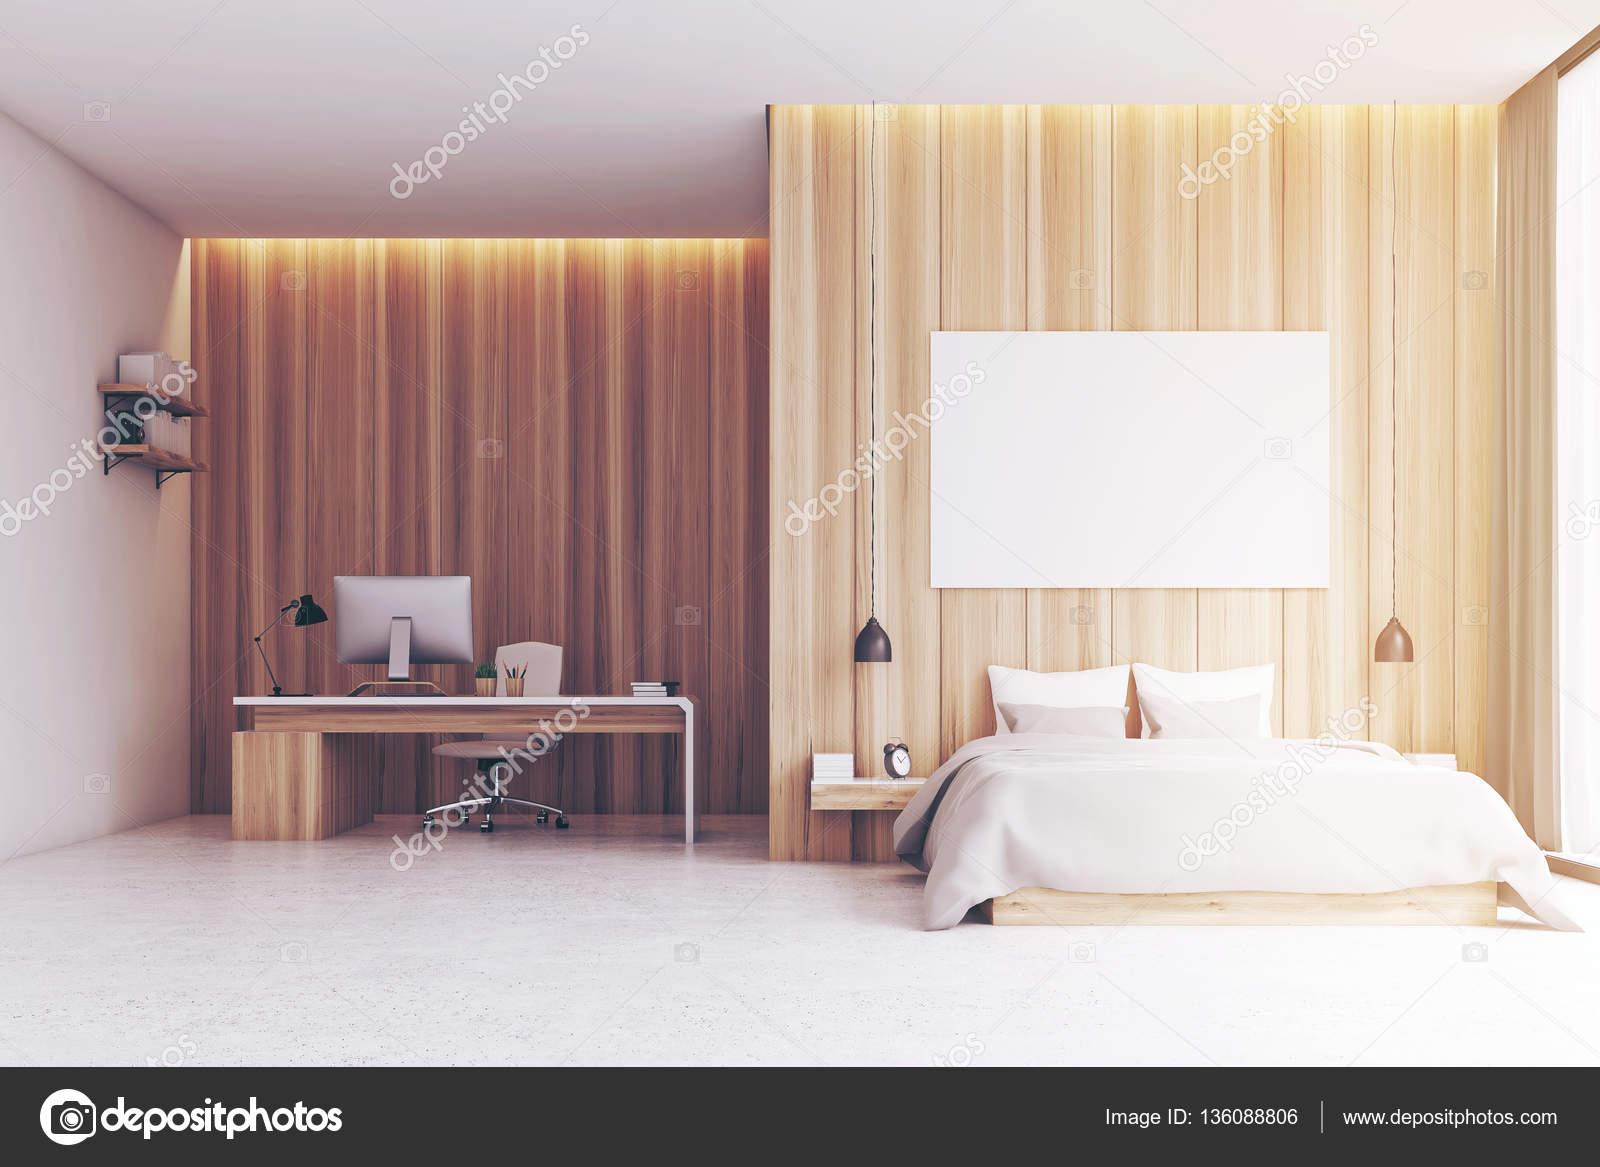 Slaapkamer Met Hout : Slaapkamer met studiegebied hout afgezwakt u2014 stockfoto